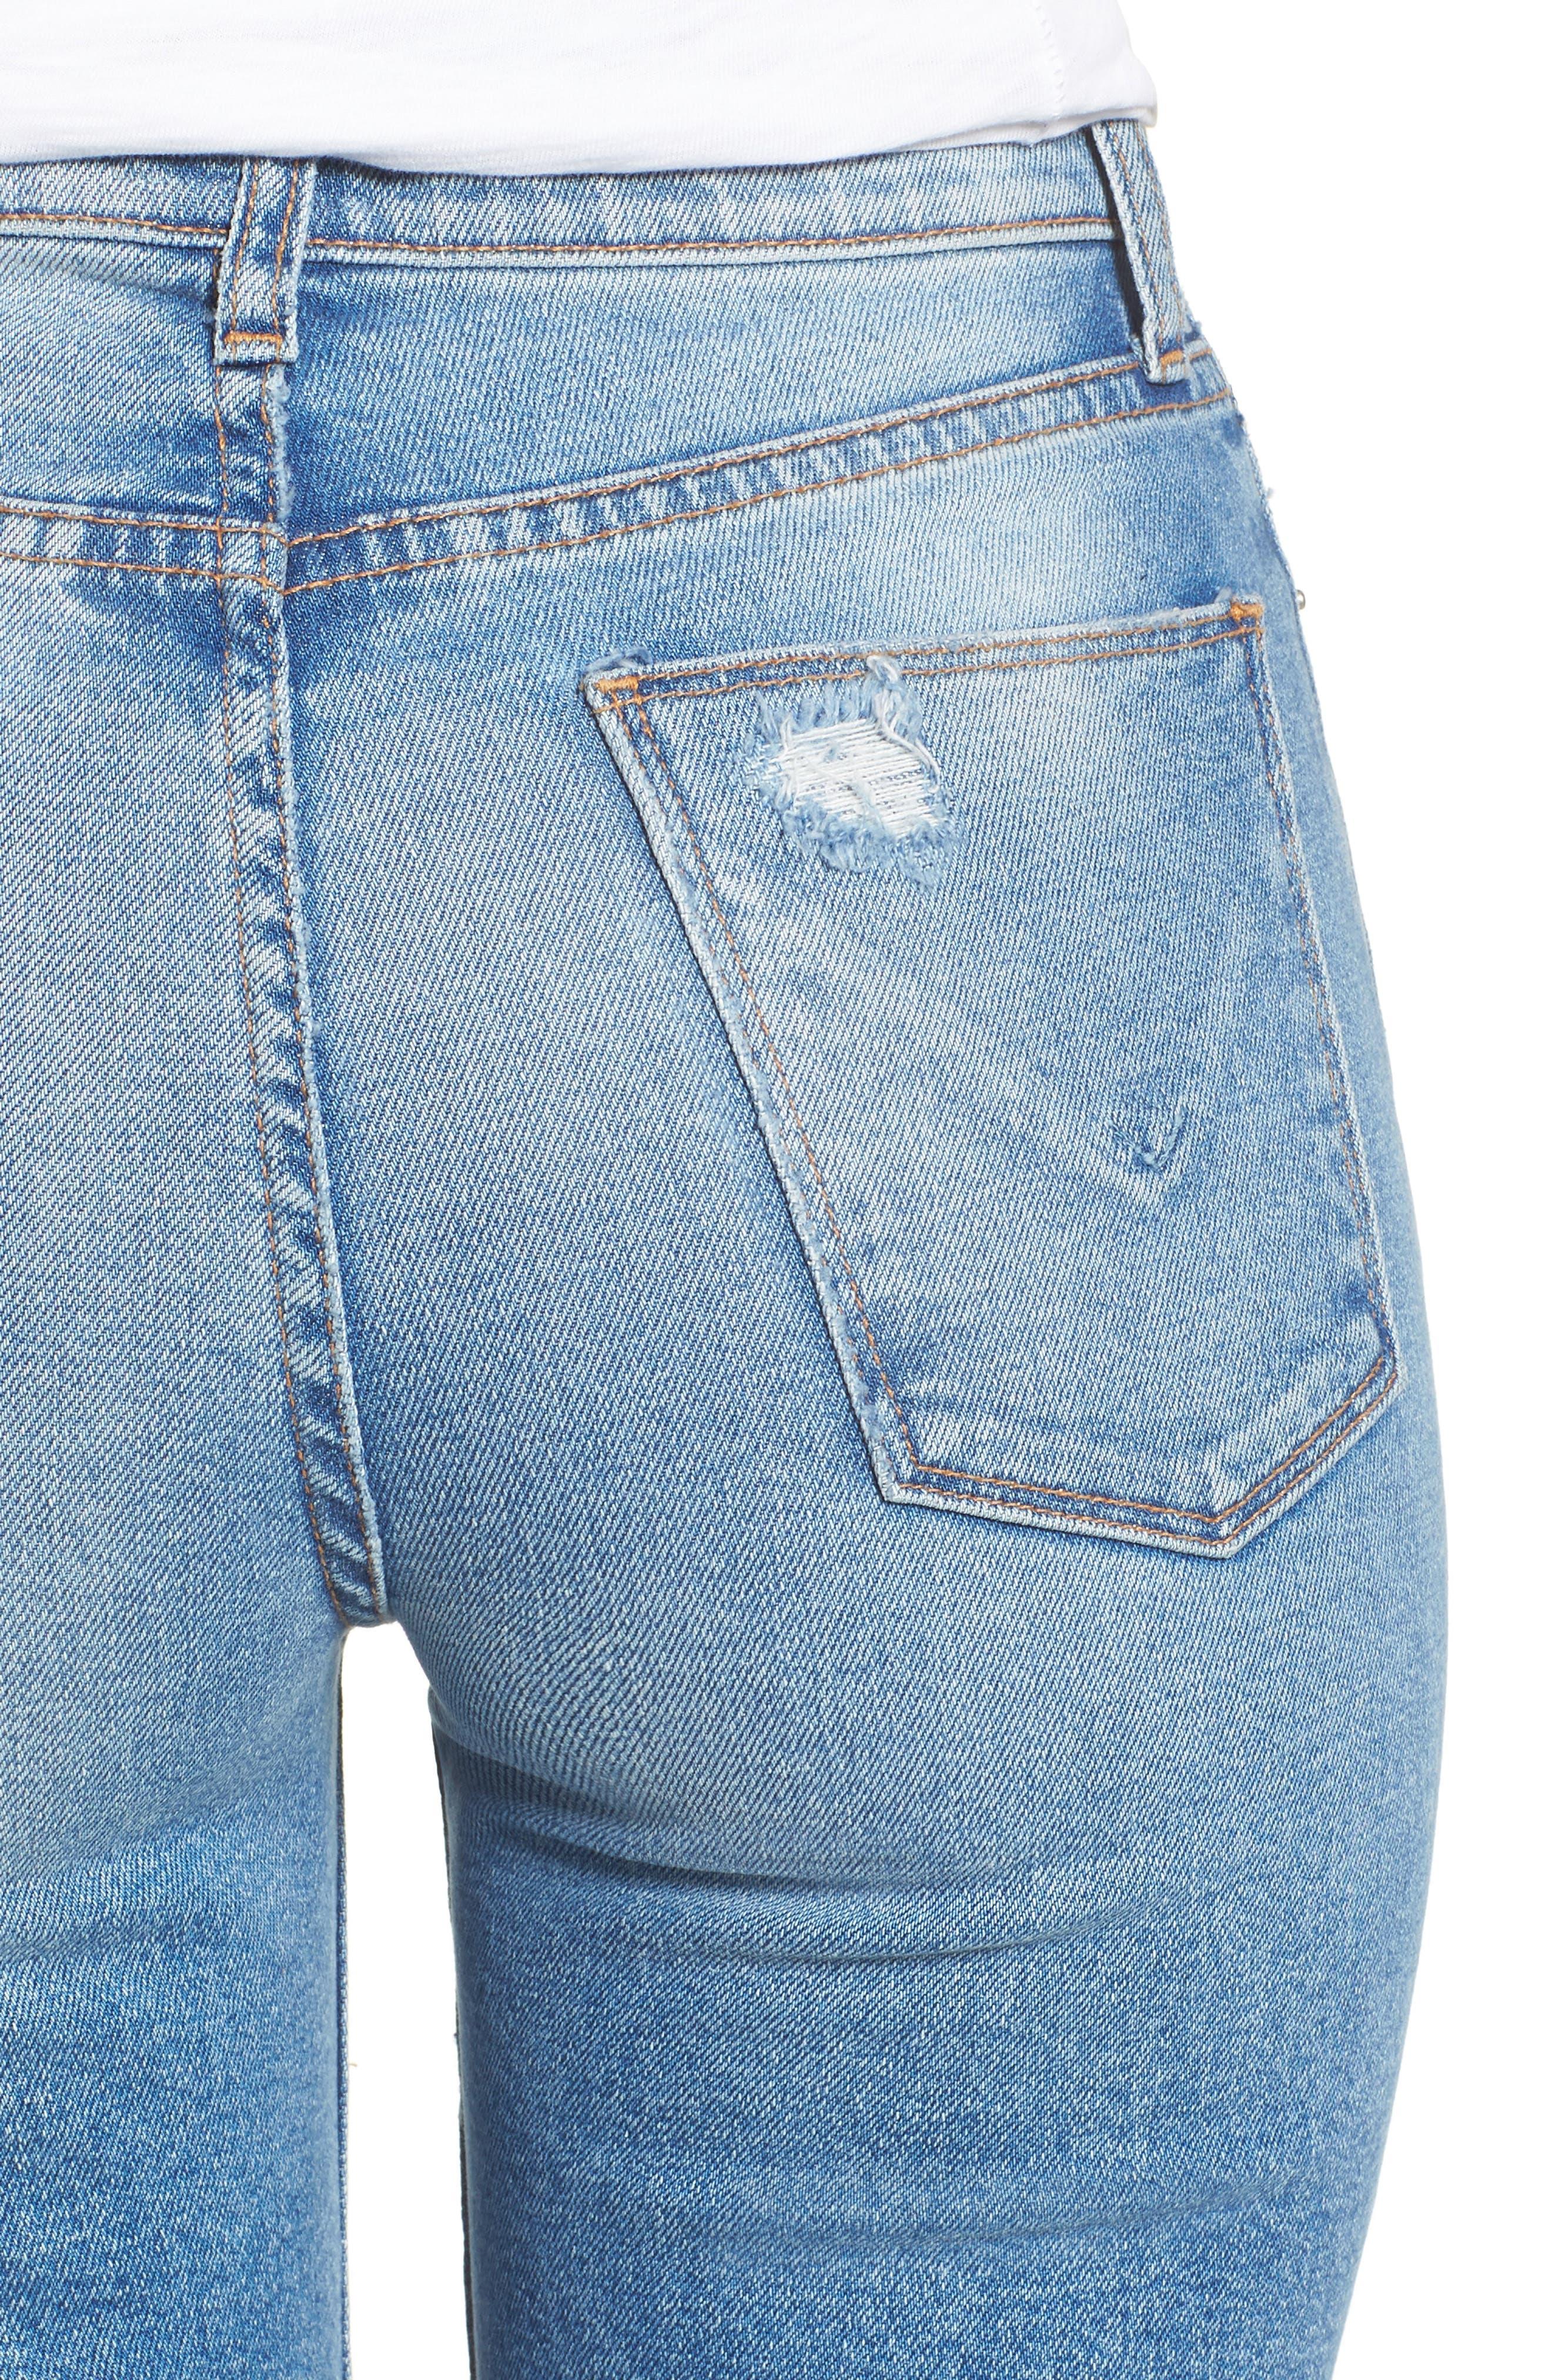 Zoeey High Waist Cuff Straight Leg Jeans,                             Alternate thumbnail 4, color,                             425